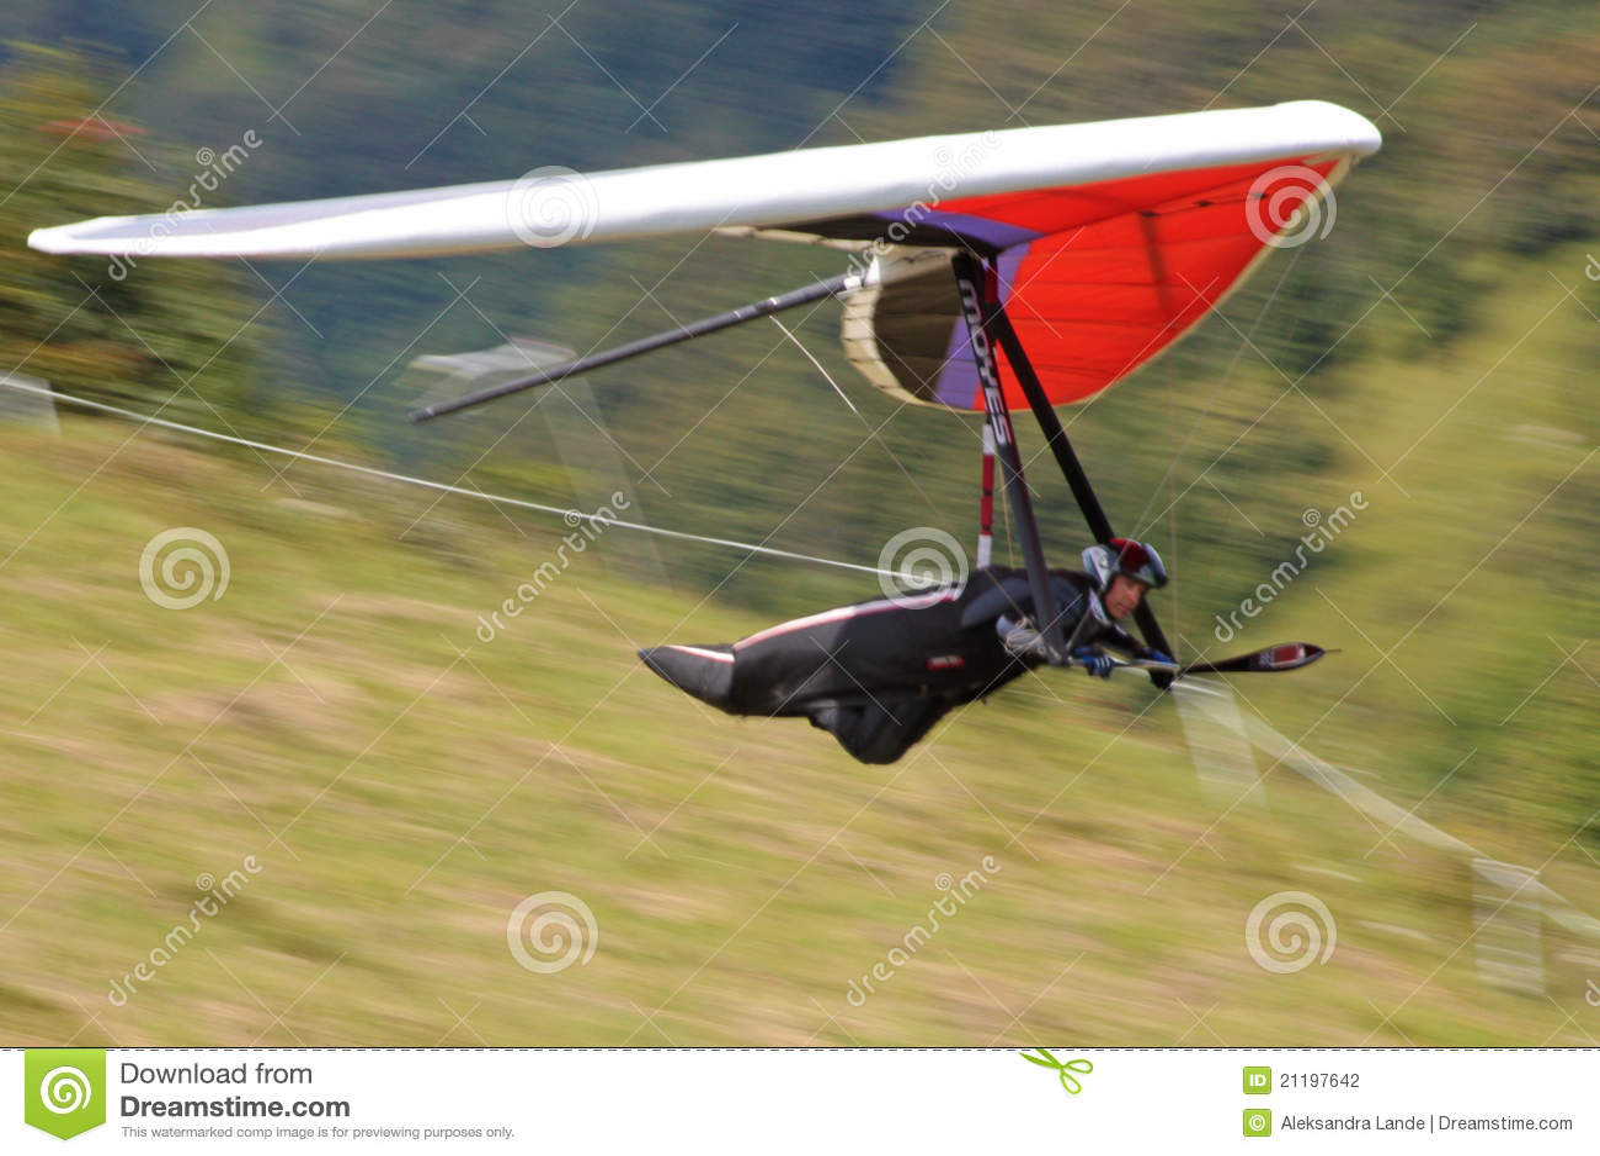 Hang gliding in Julian Alps